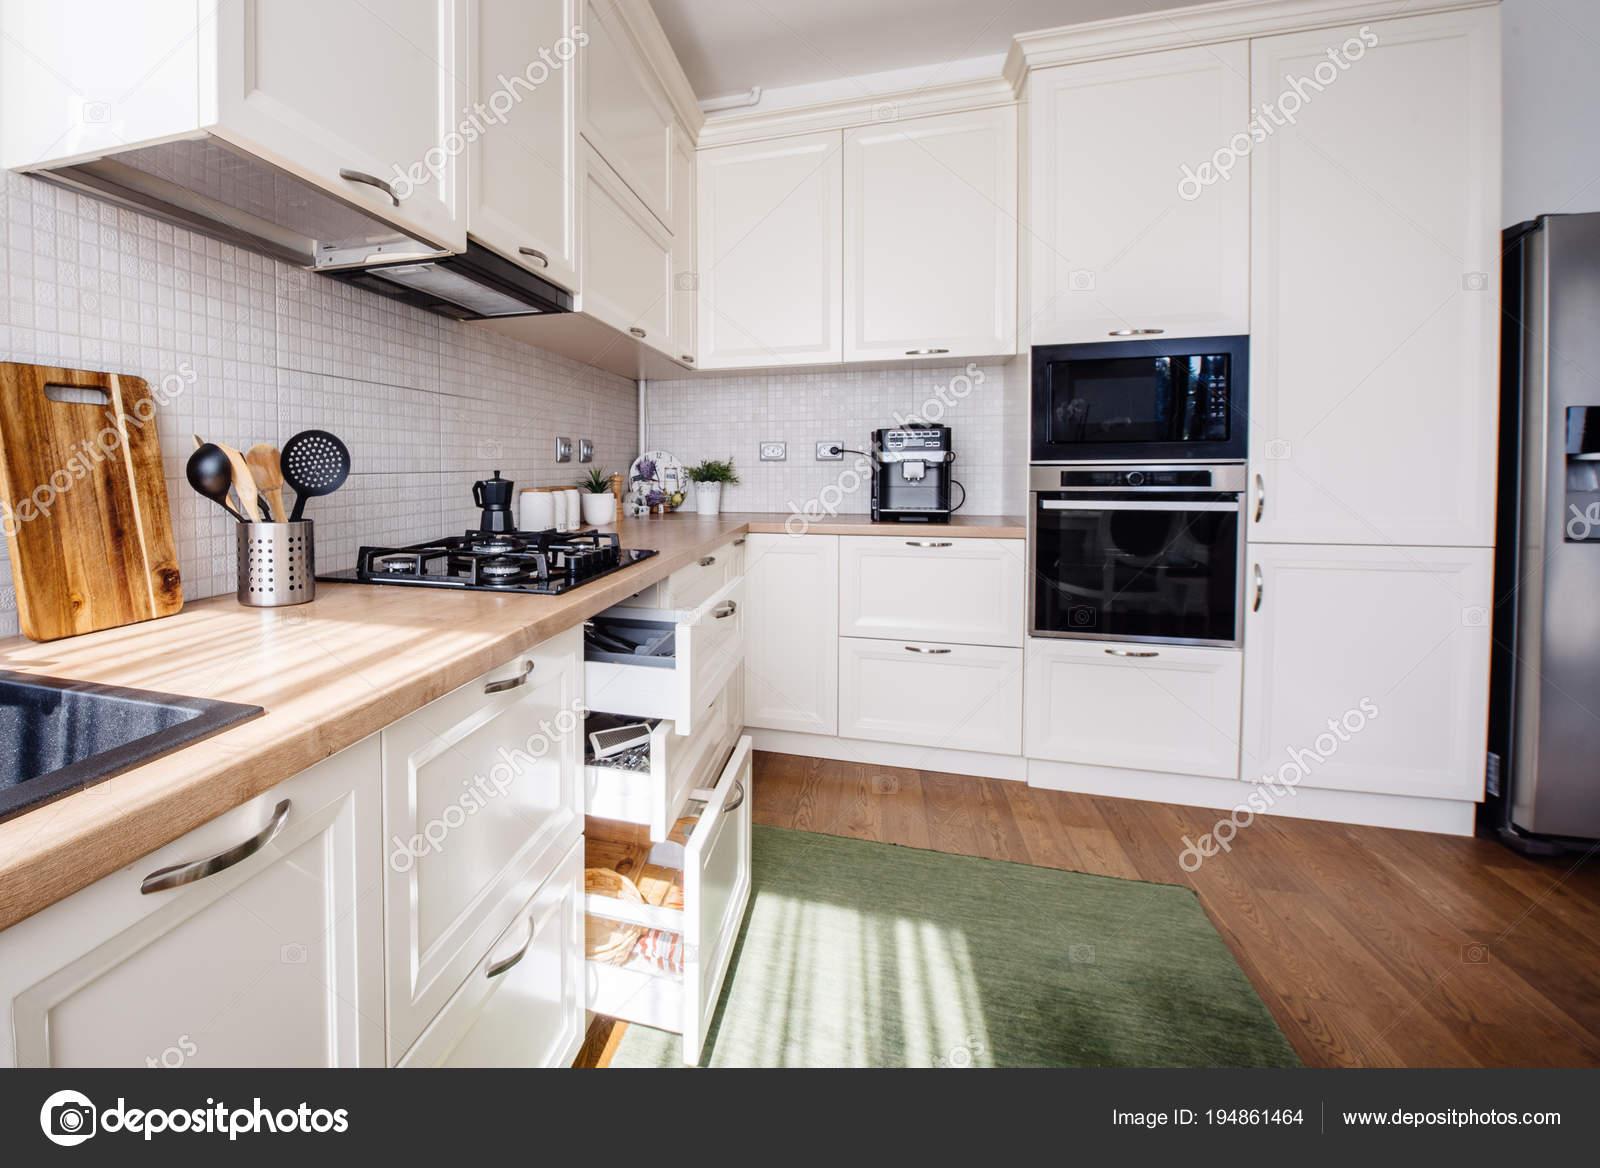 Cucina moderna design, mobili nuovi e nuova casa — Foto ...